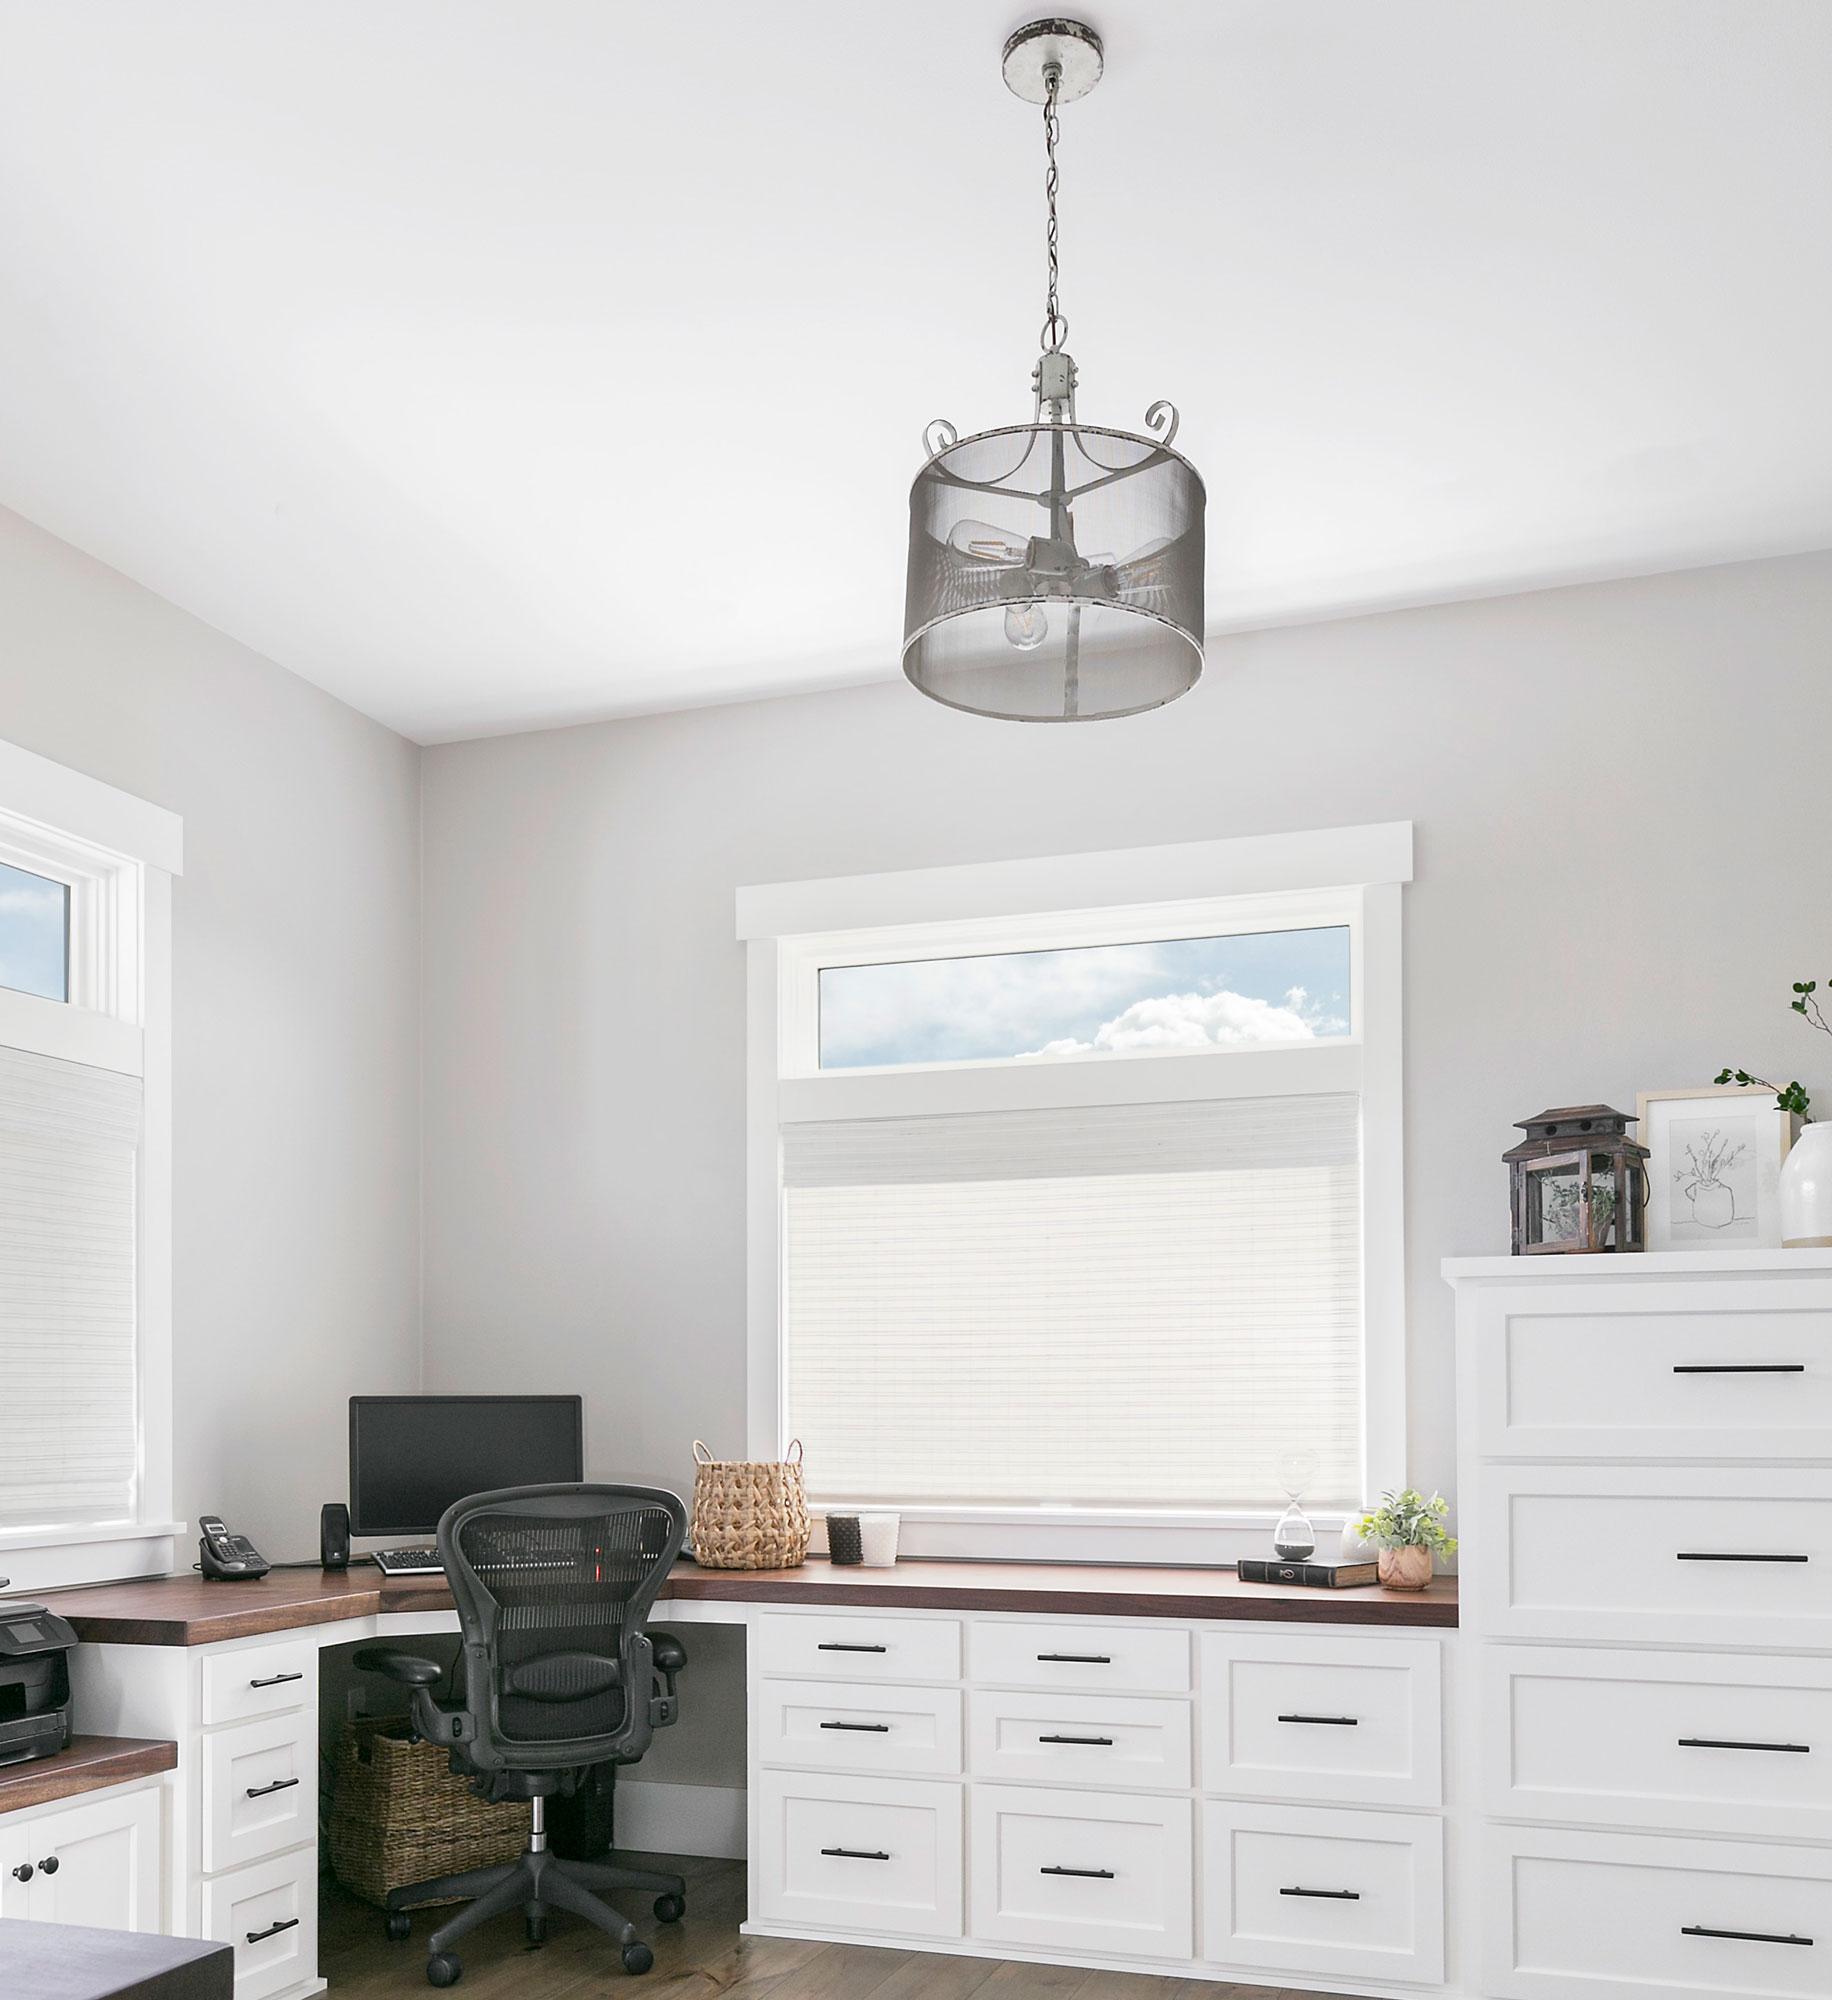 Modern Farmhouse Kitchen Cabinets Gray